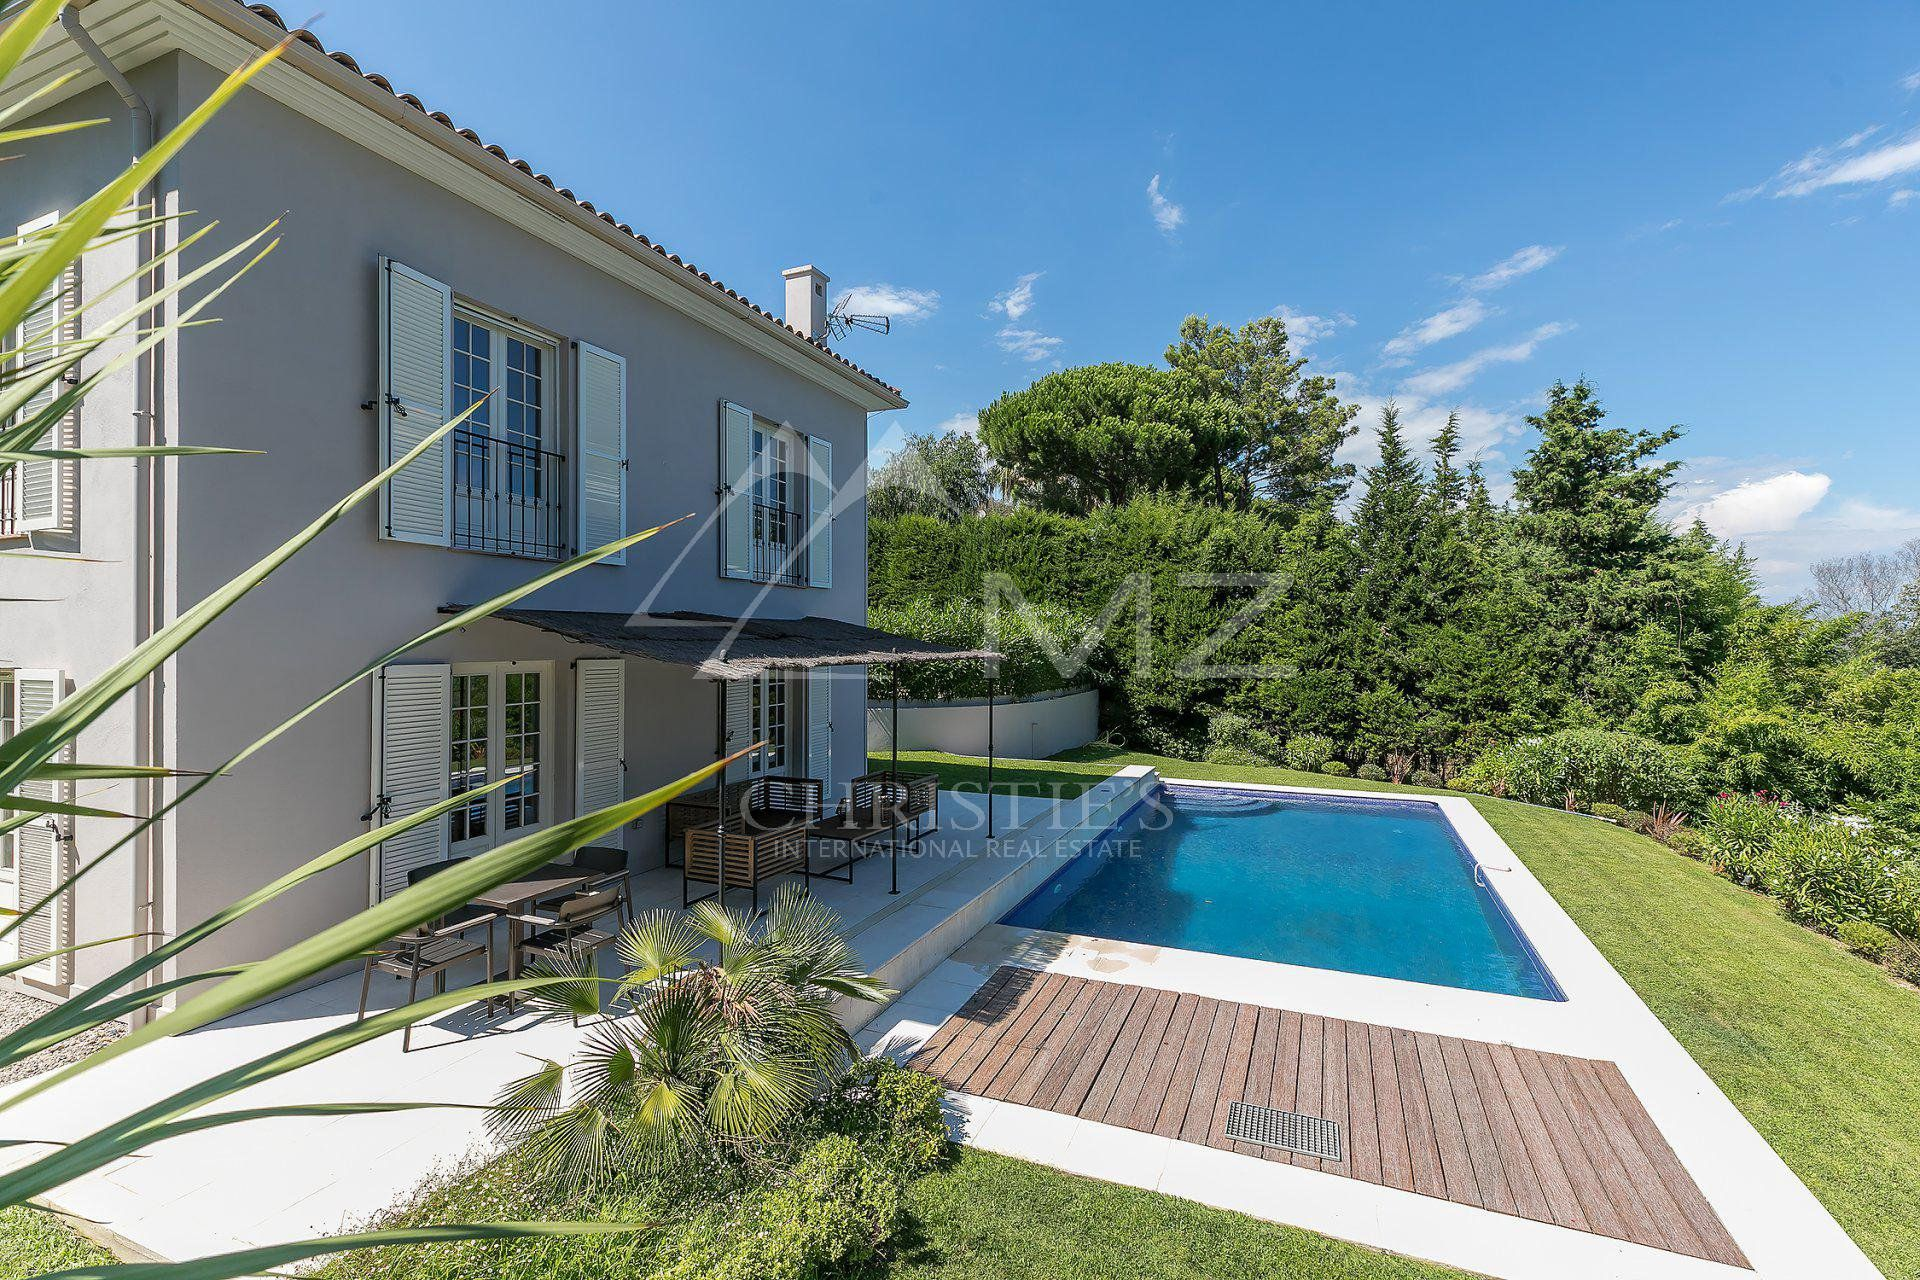 Cannes - Super Cannes - Newly built villa